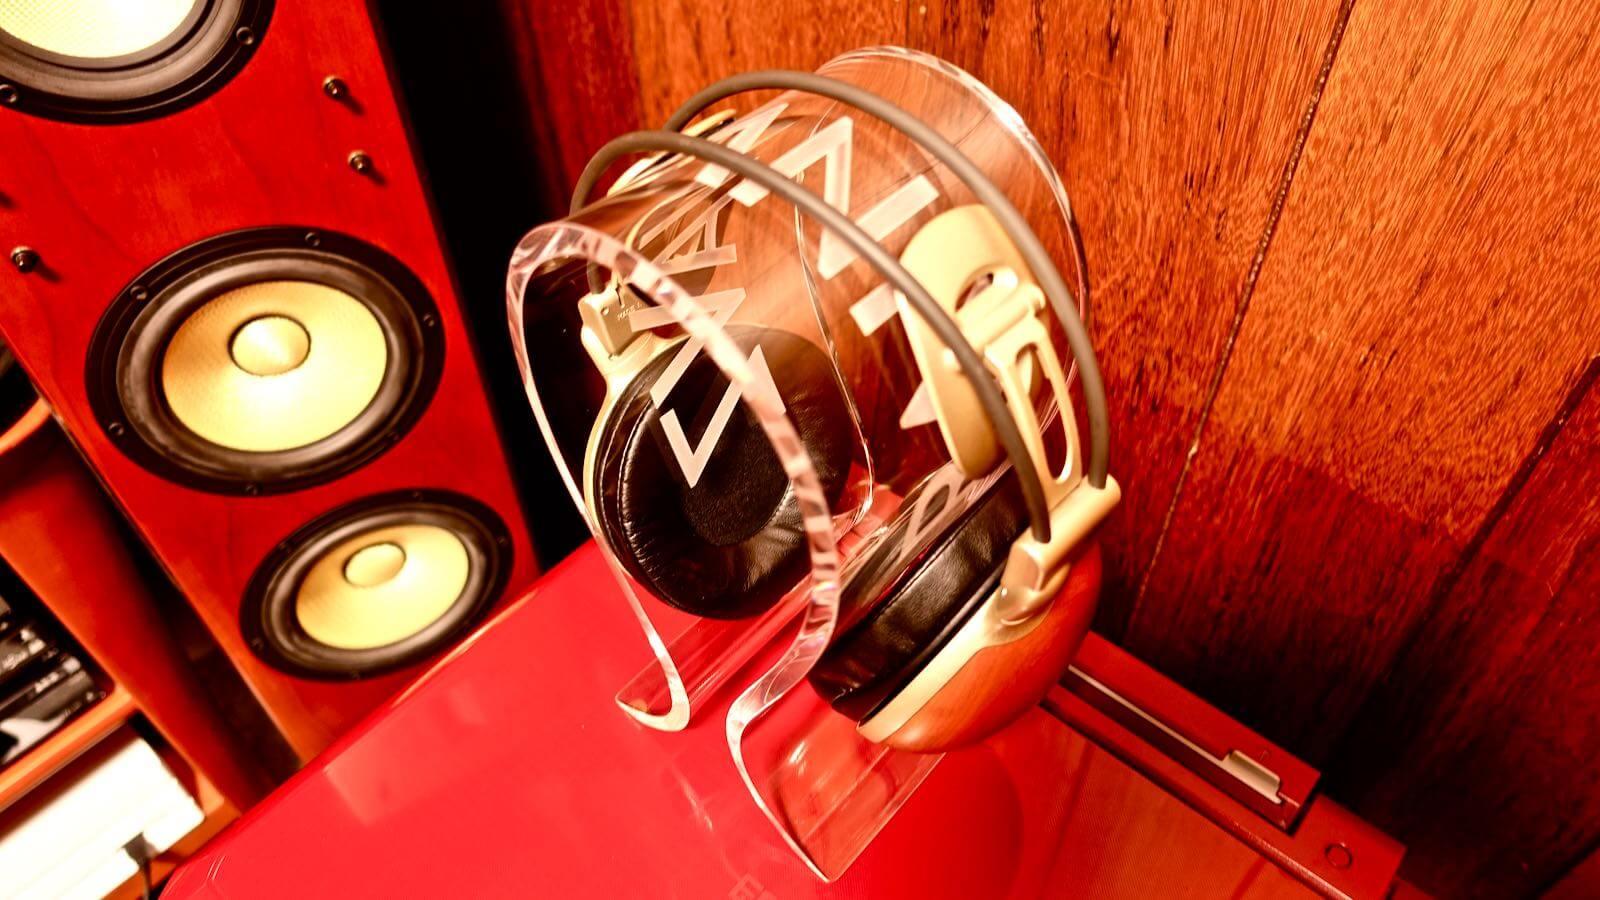 0080 OMEGA type headphone stand BRAINWAVZ review 09